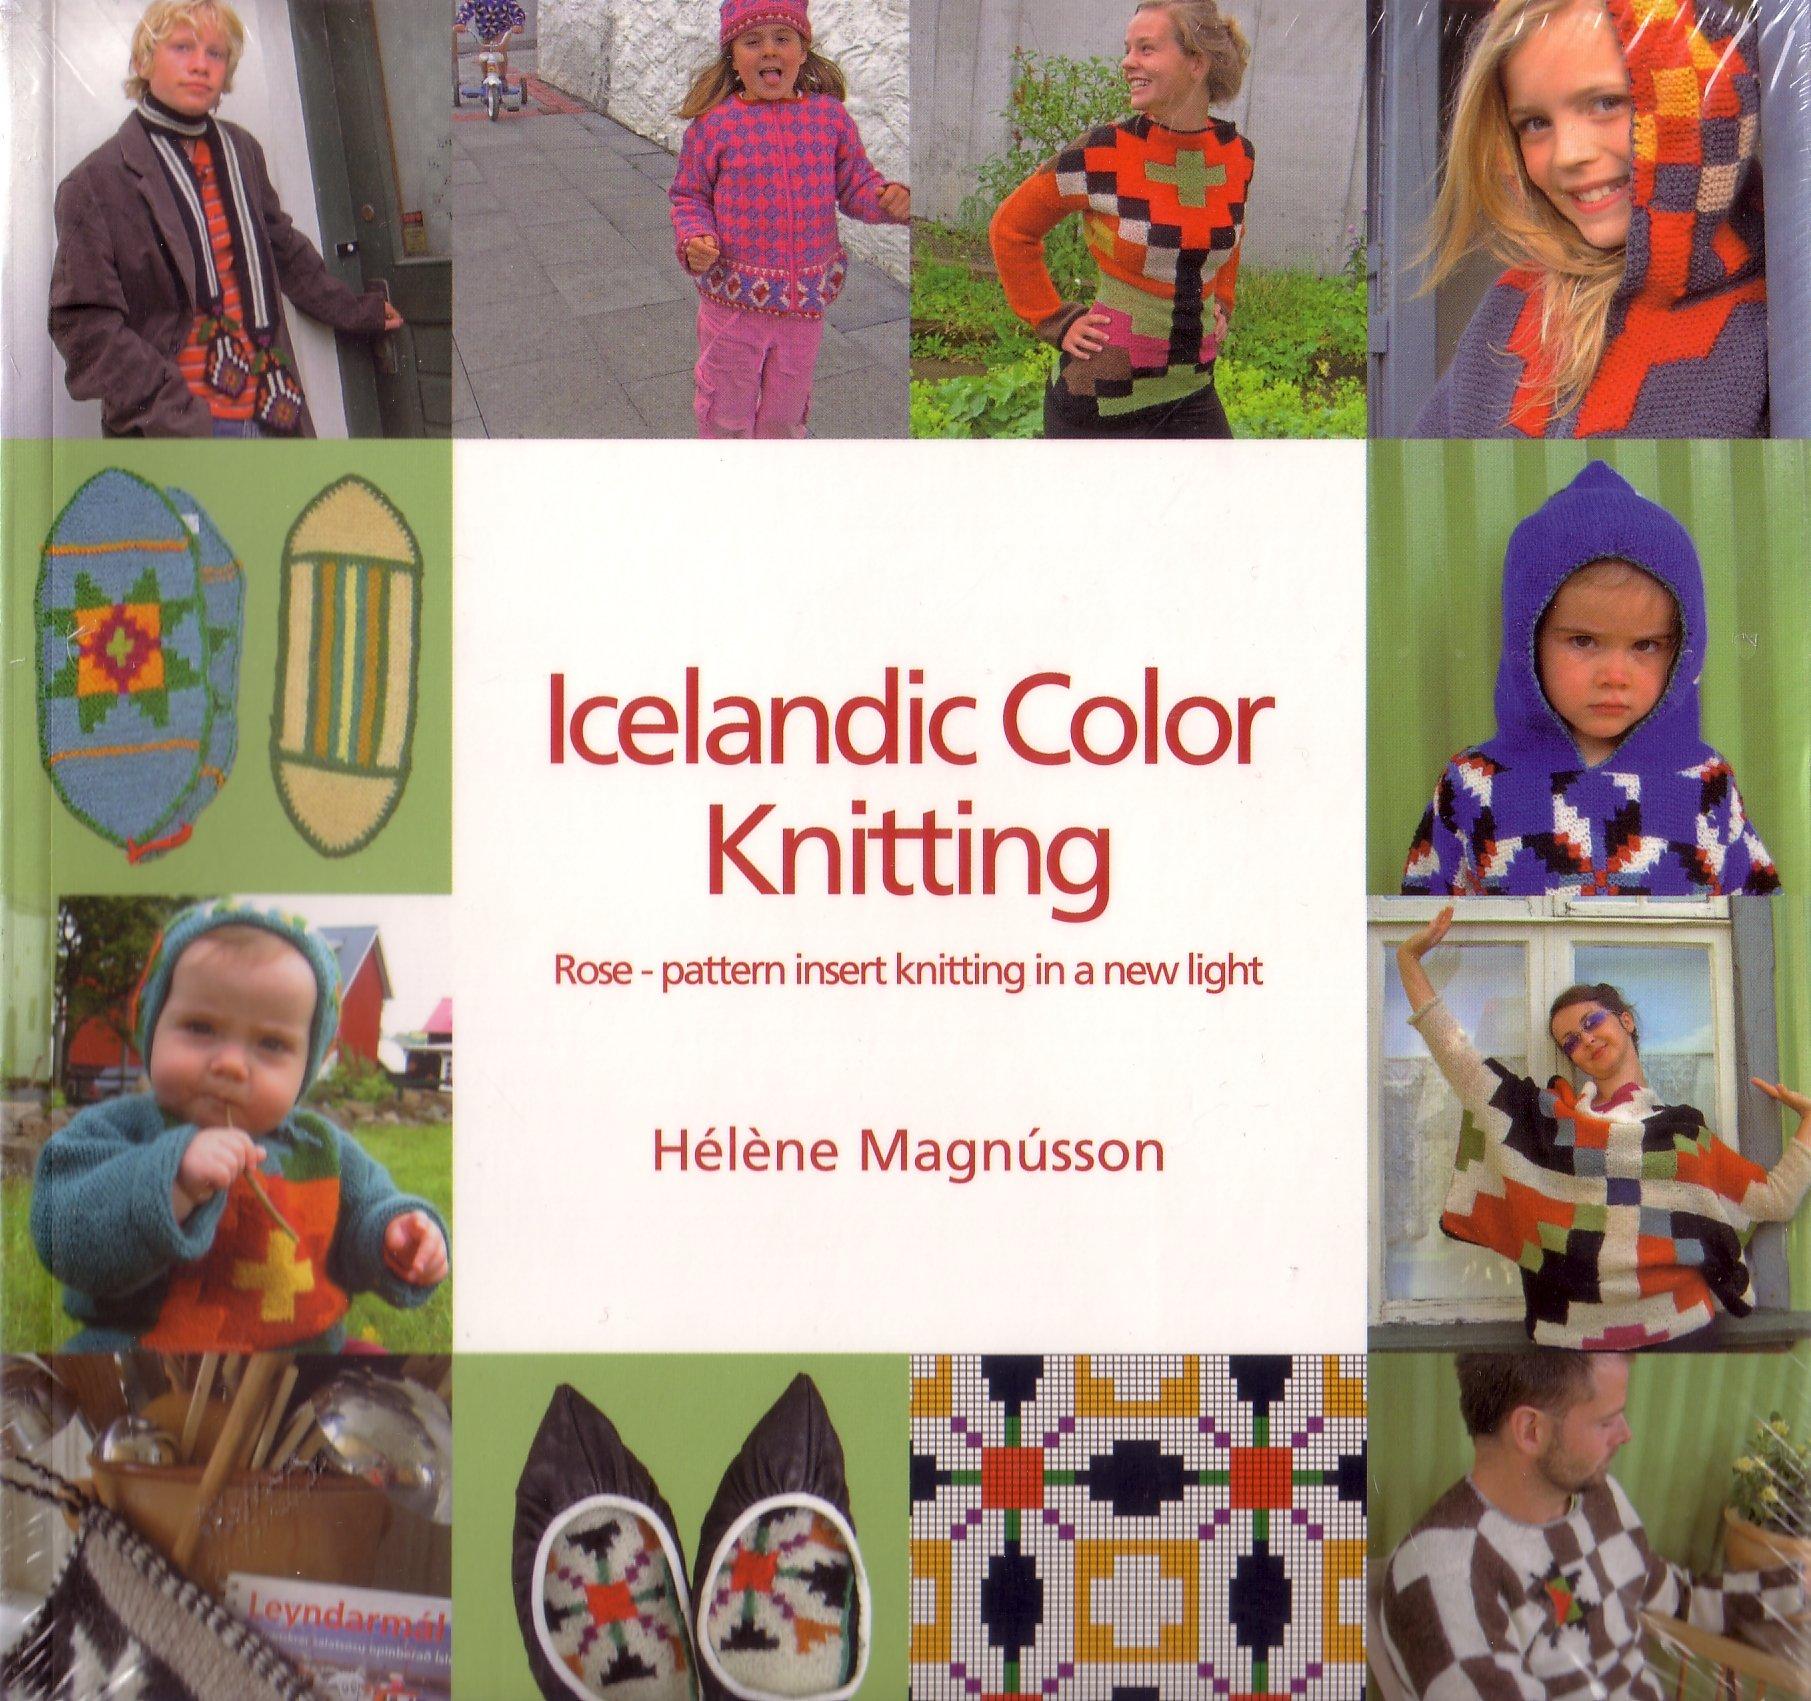 Icelandic color knitting: rose-pattern insert knitting in a new light